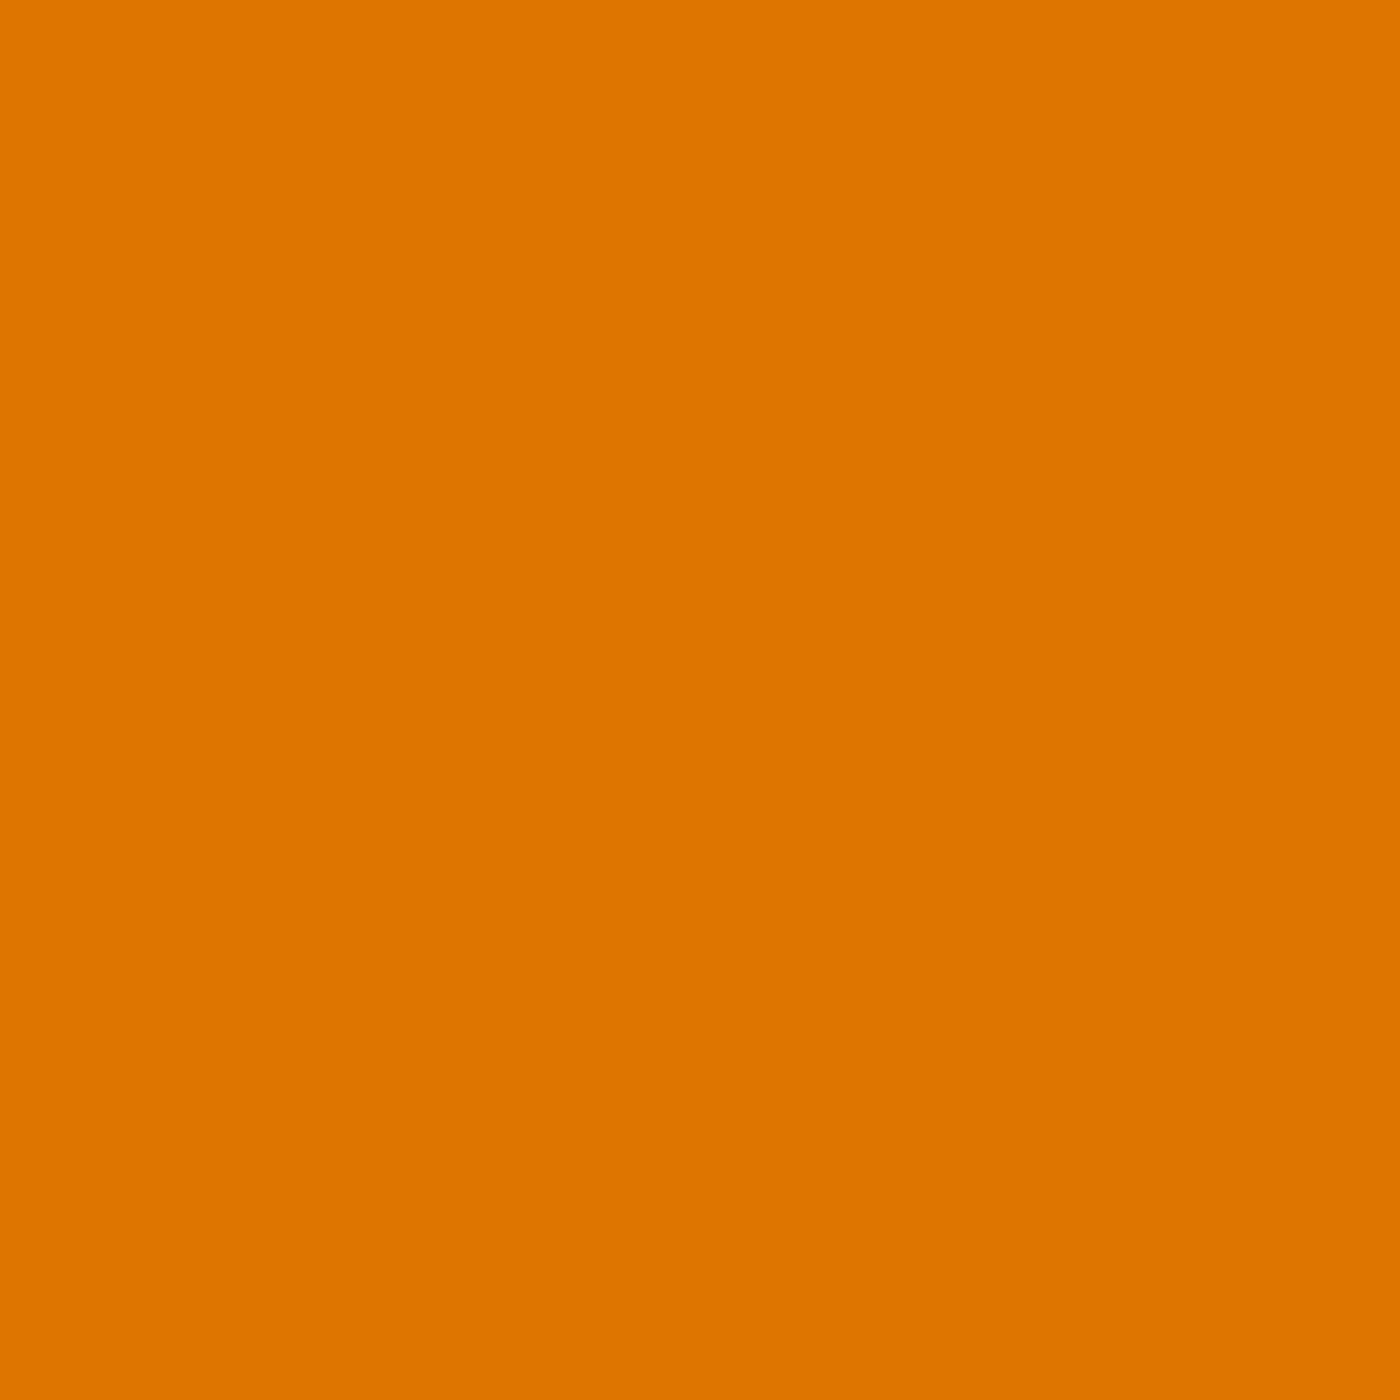 "Oracal 651 Vinyl Roll 12"" x 50 yard (150 feet) (Light Orange)"